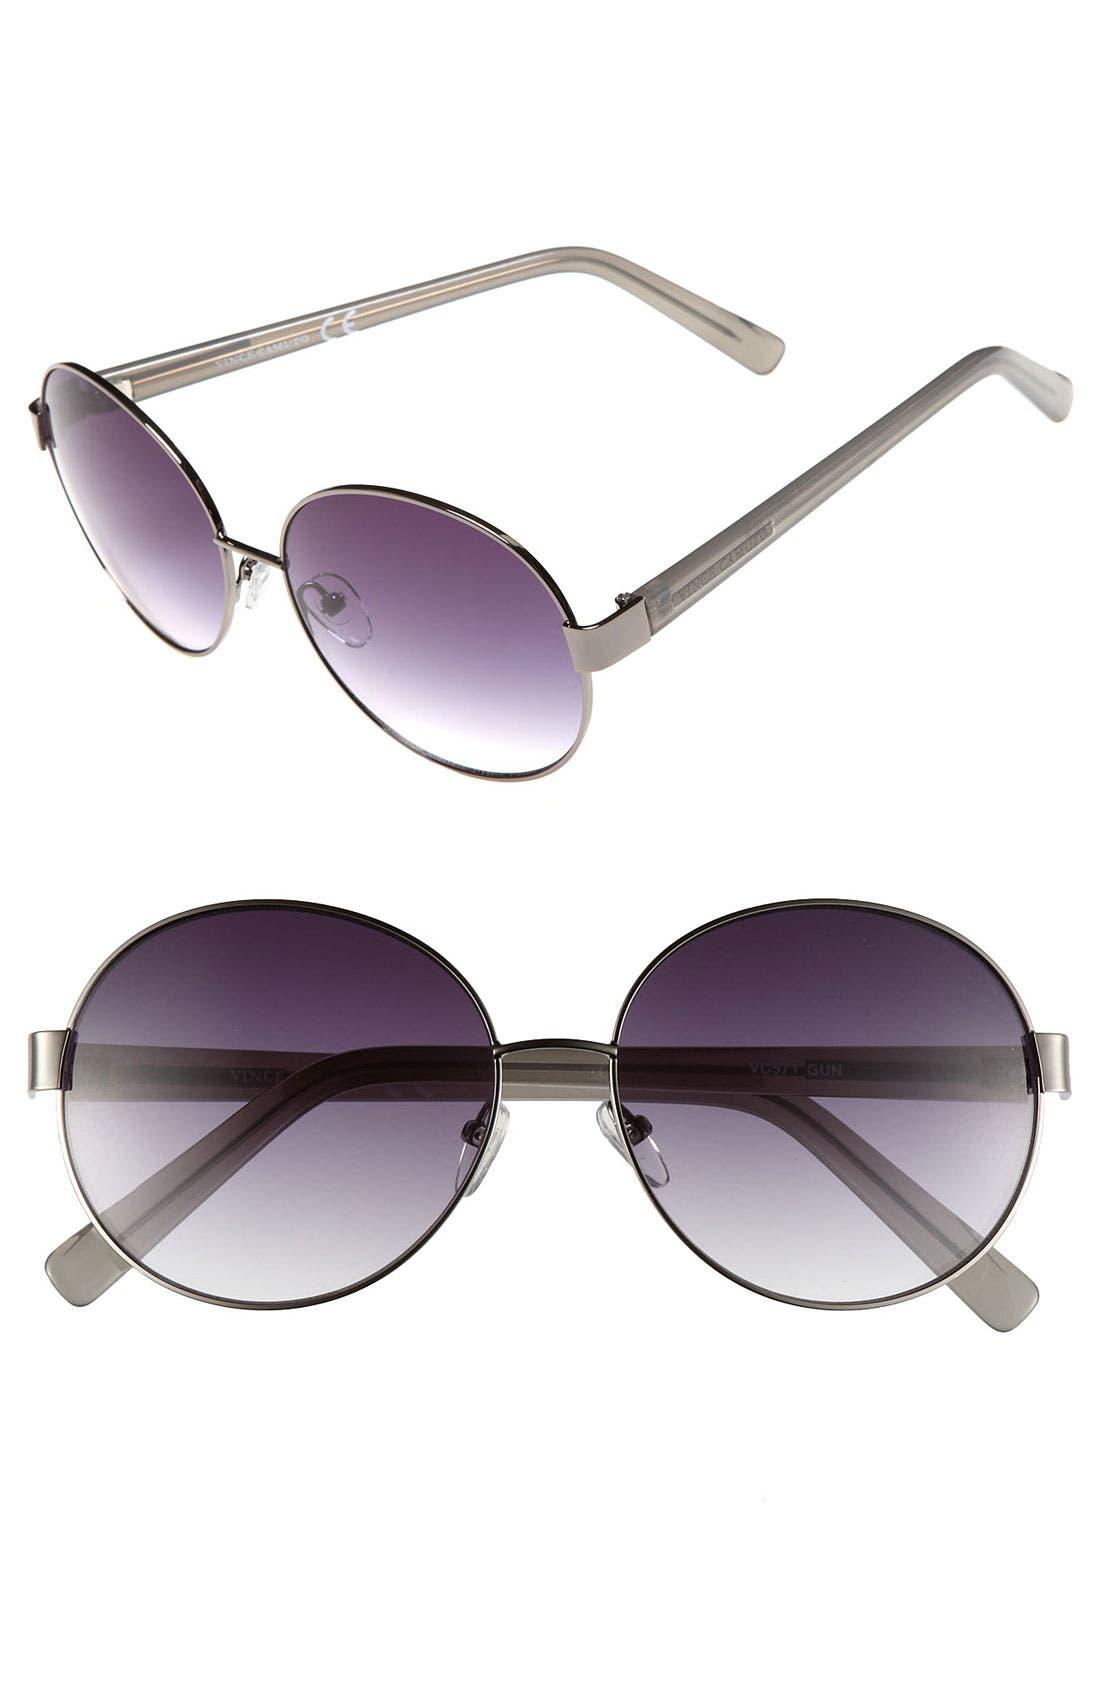 Main Image - Vince Camuto Retro Sunglasses